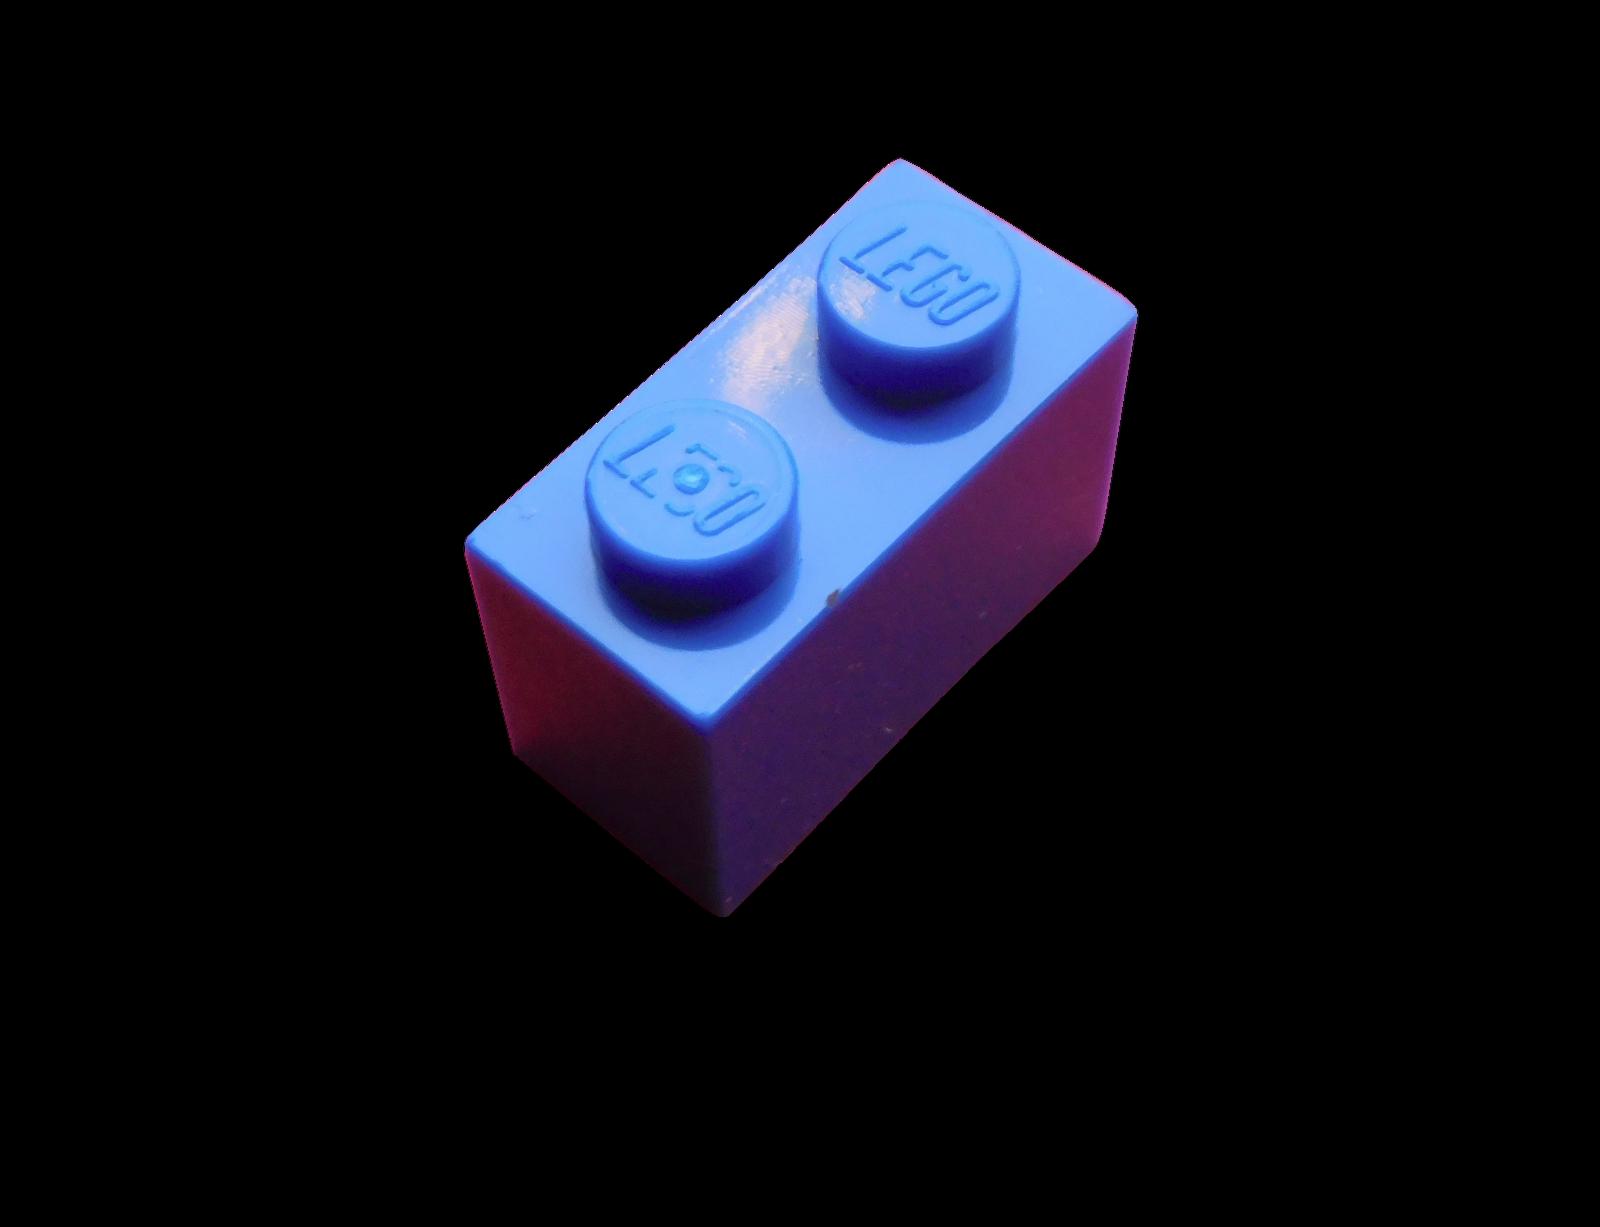 LEGO ® 4 x Basic pietra 1x6 Arancione Nuovo 3009